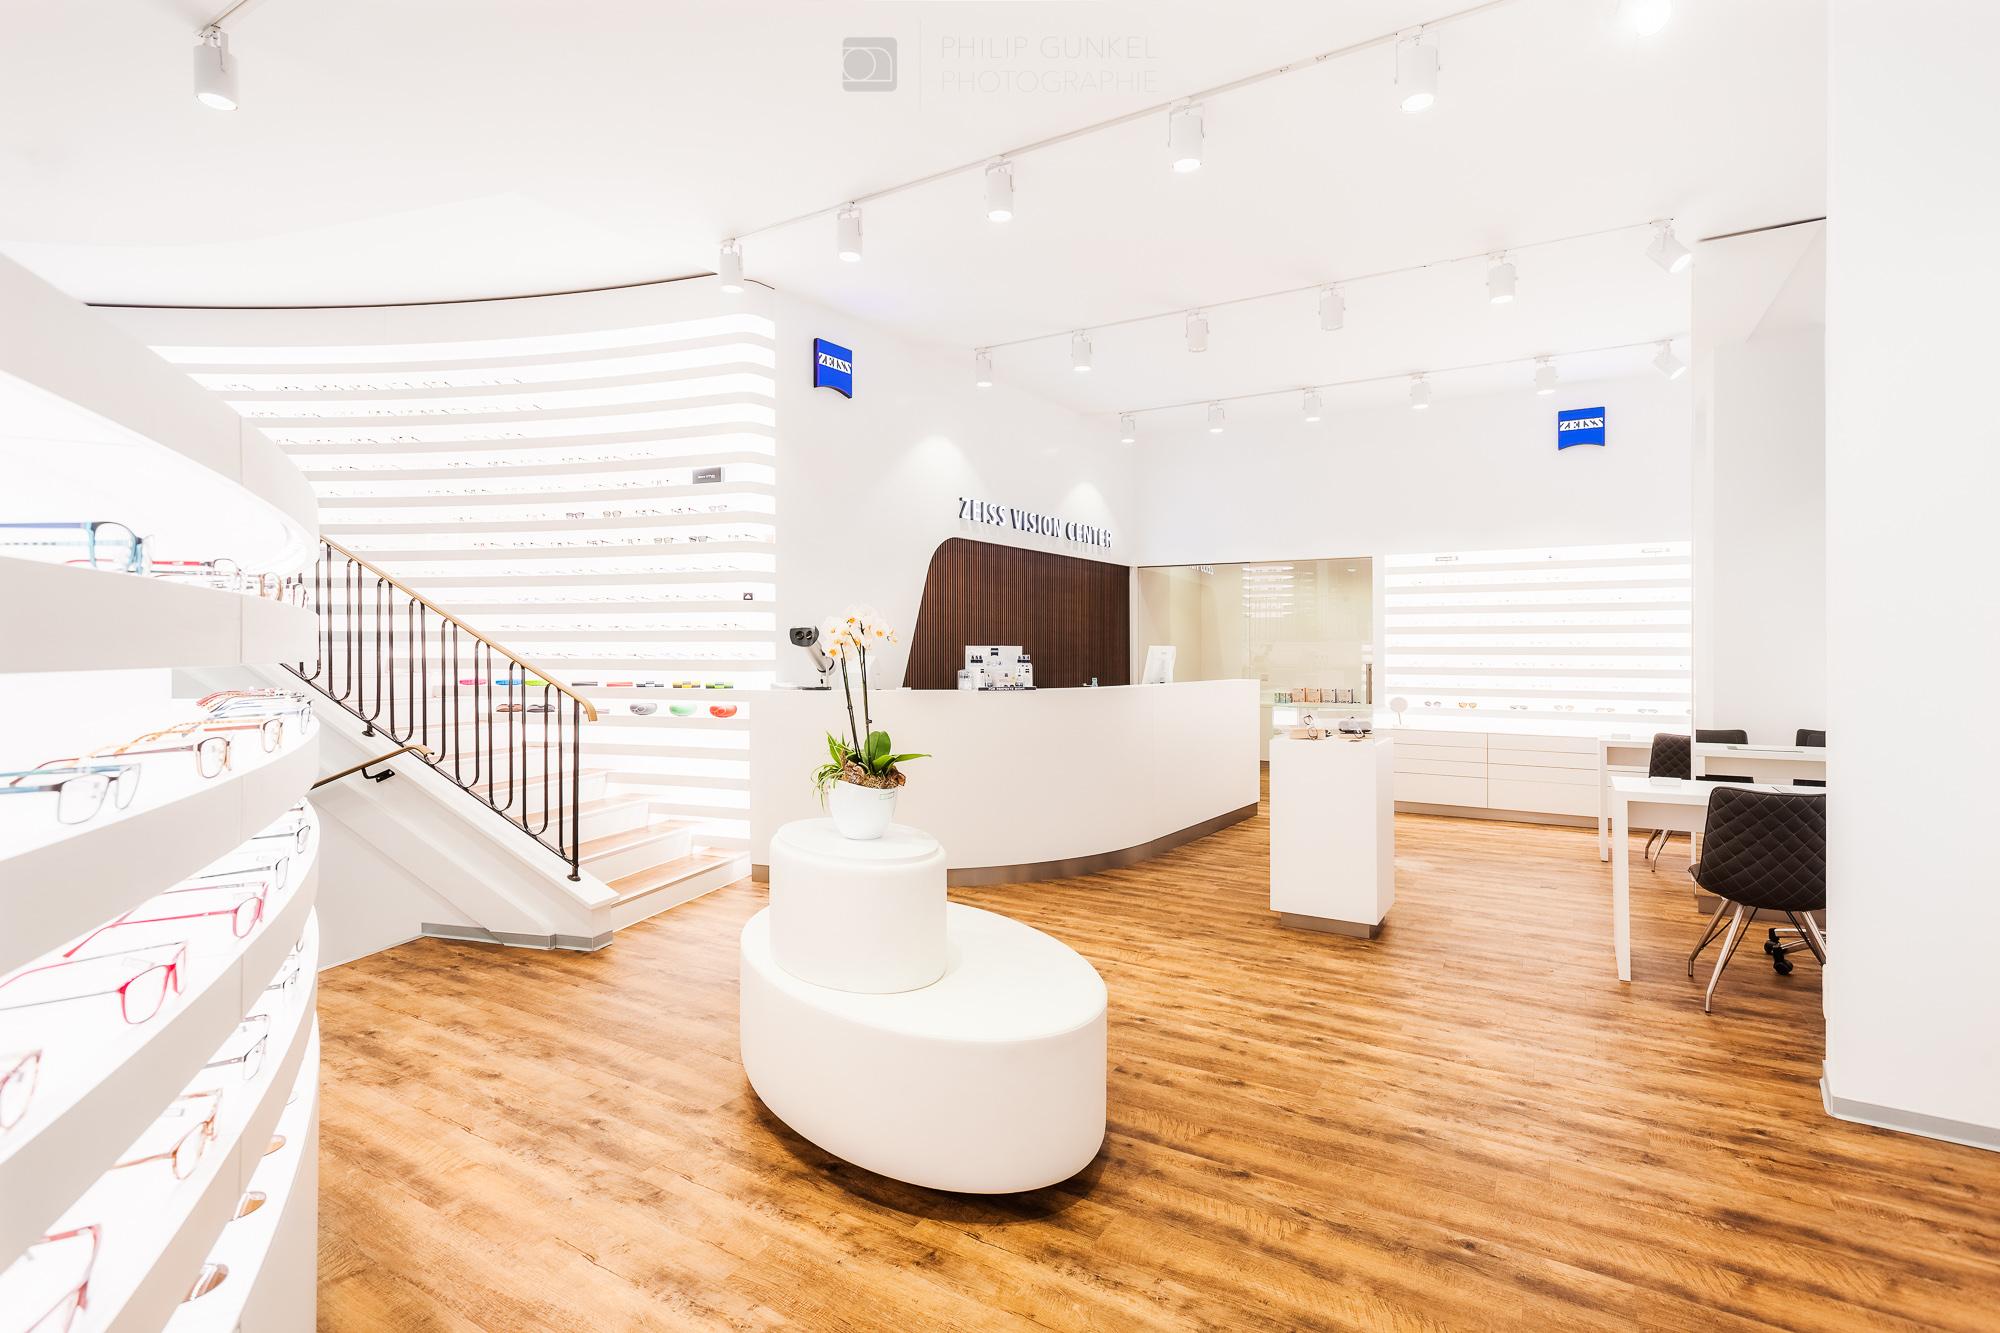 Zeiss Vision Center Kassel